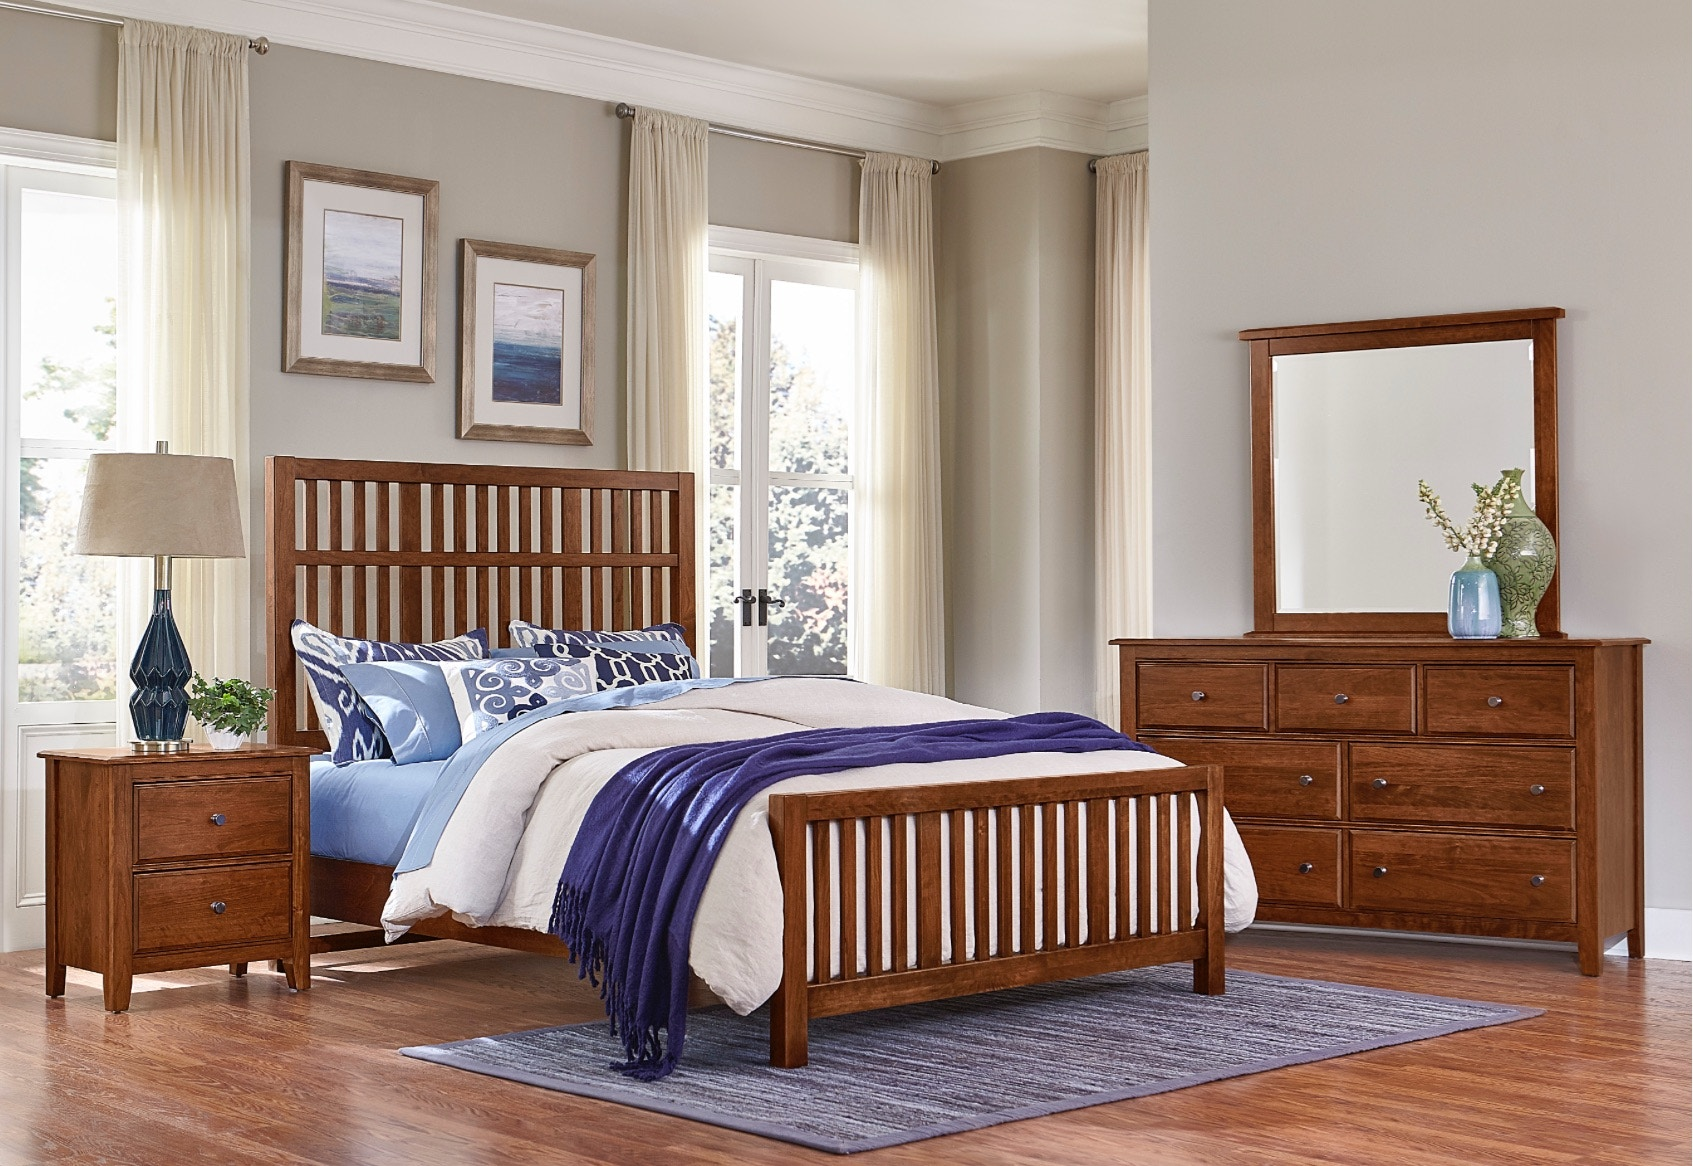 Craftsman Bedroom Furniture - Furniture company artisan u0026 post villa craftsman bedroom set